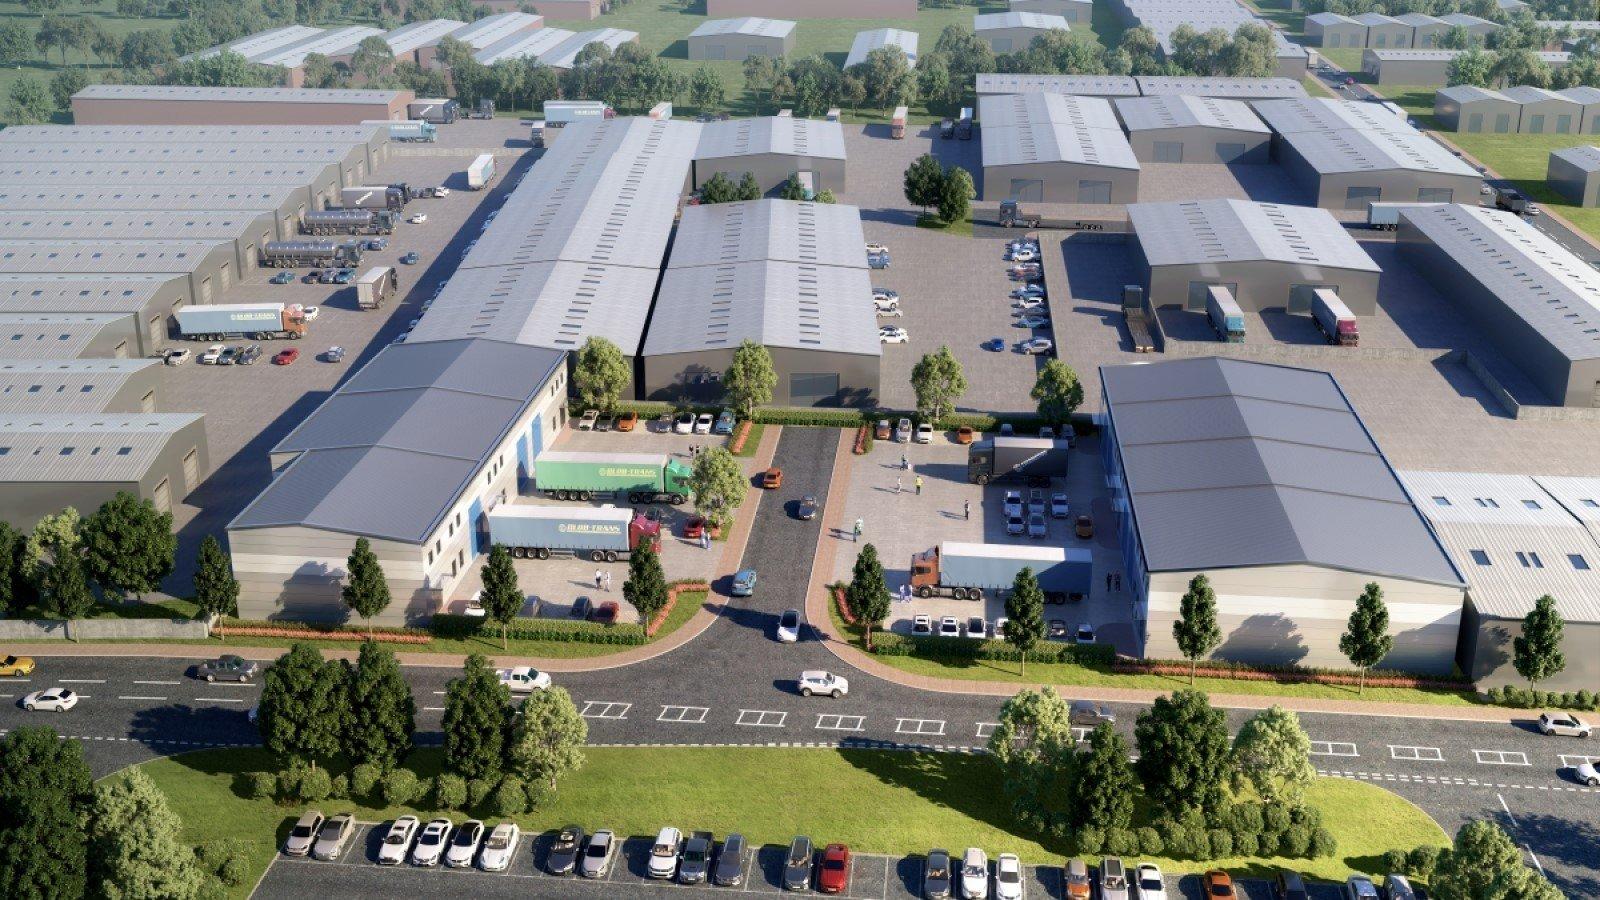 Work to start on new trade development - Launton Trade Park - in Bicester